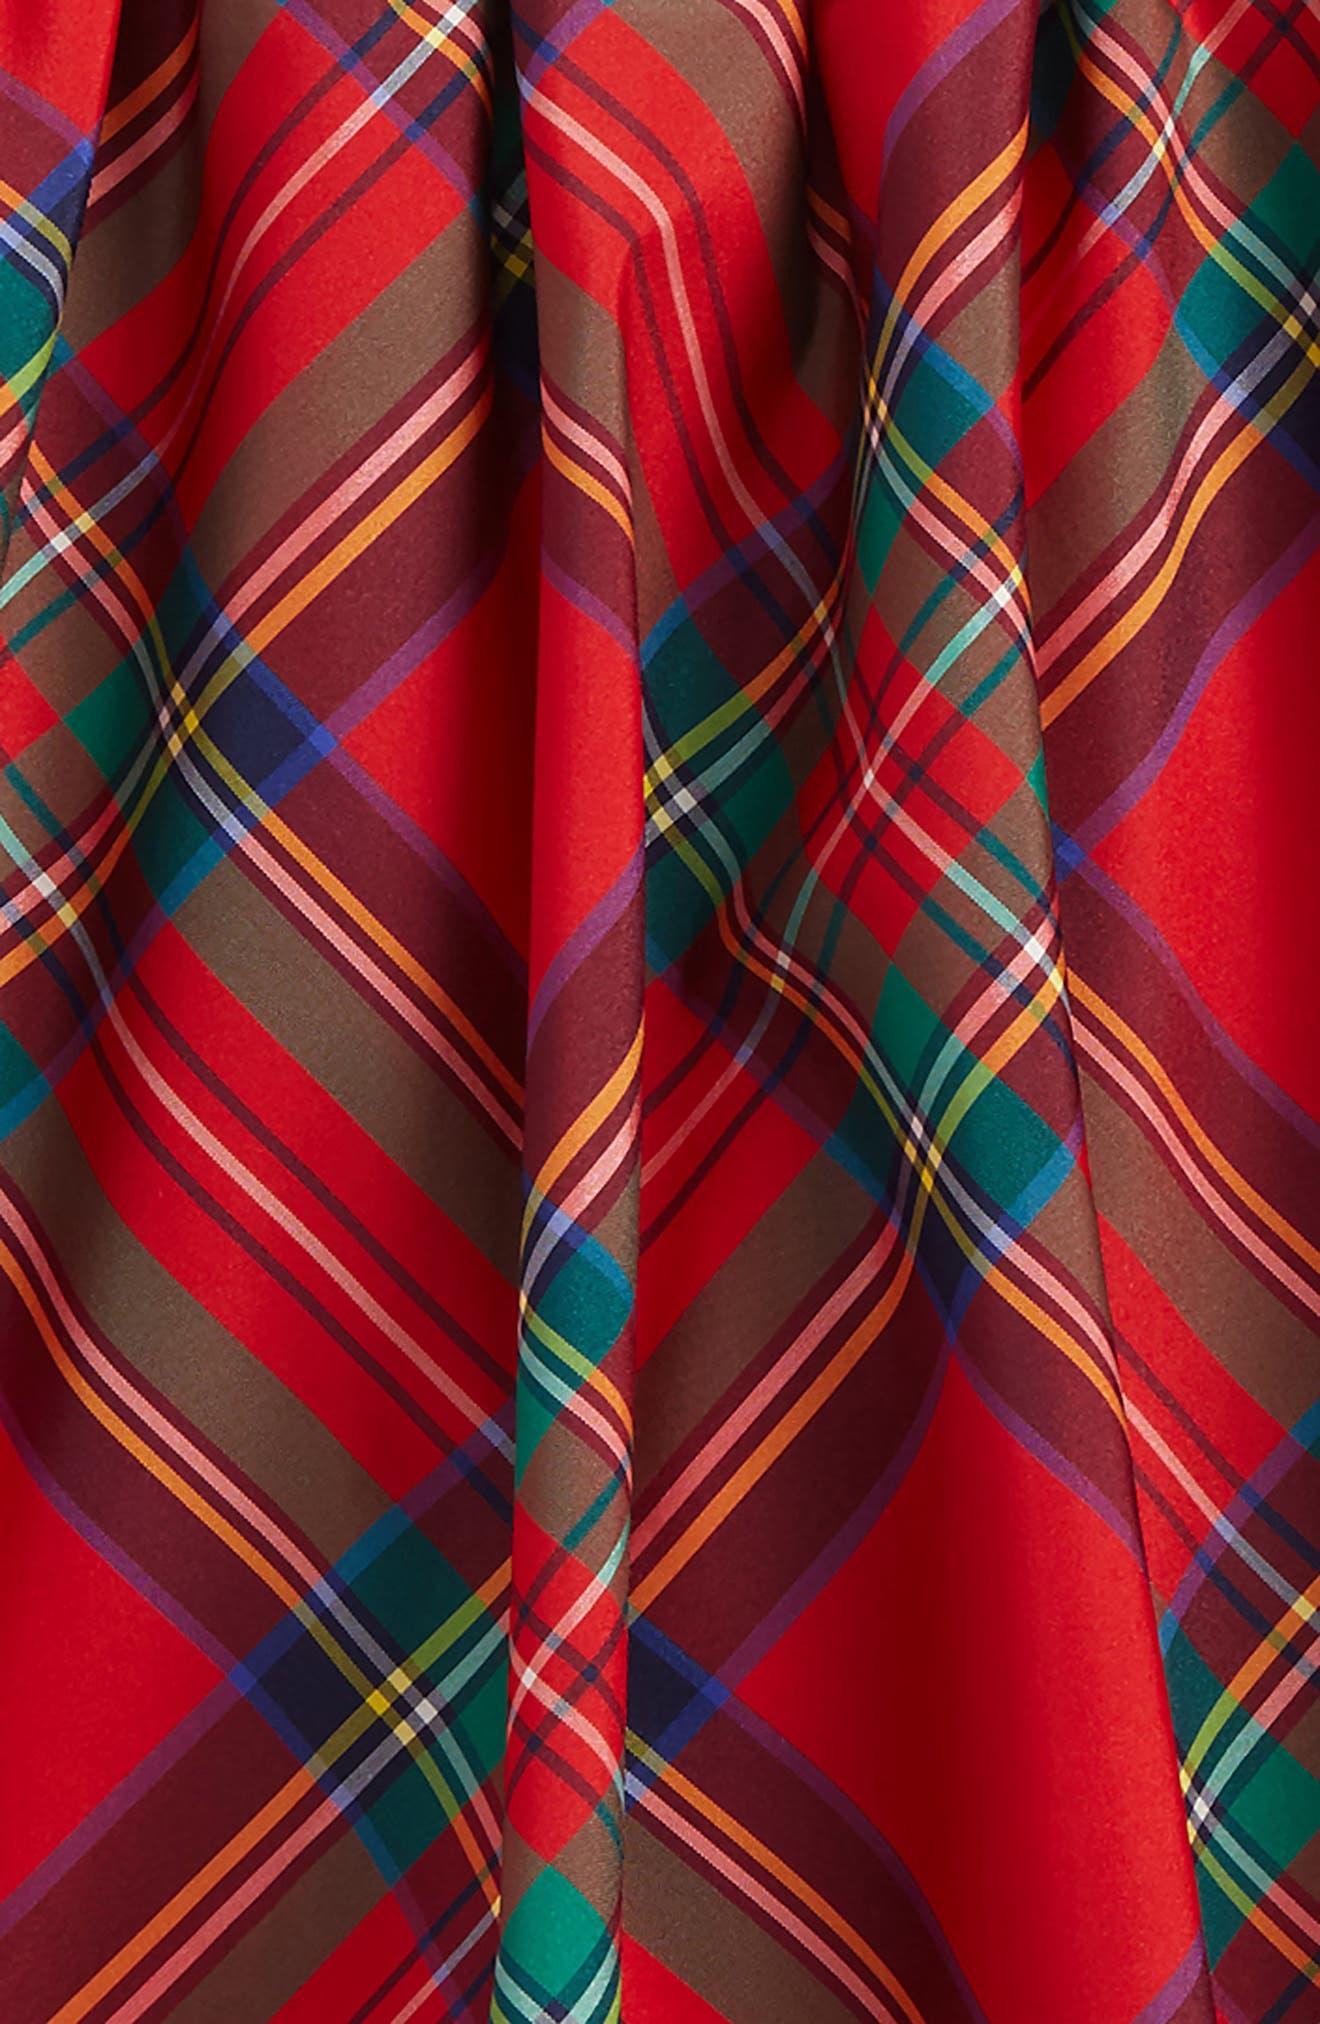 Jolly Plaid Holiday Skirt,                             Alternate thumbnail 2, color,                             634